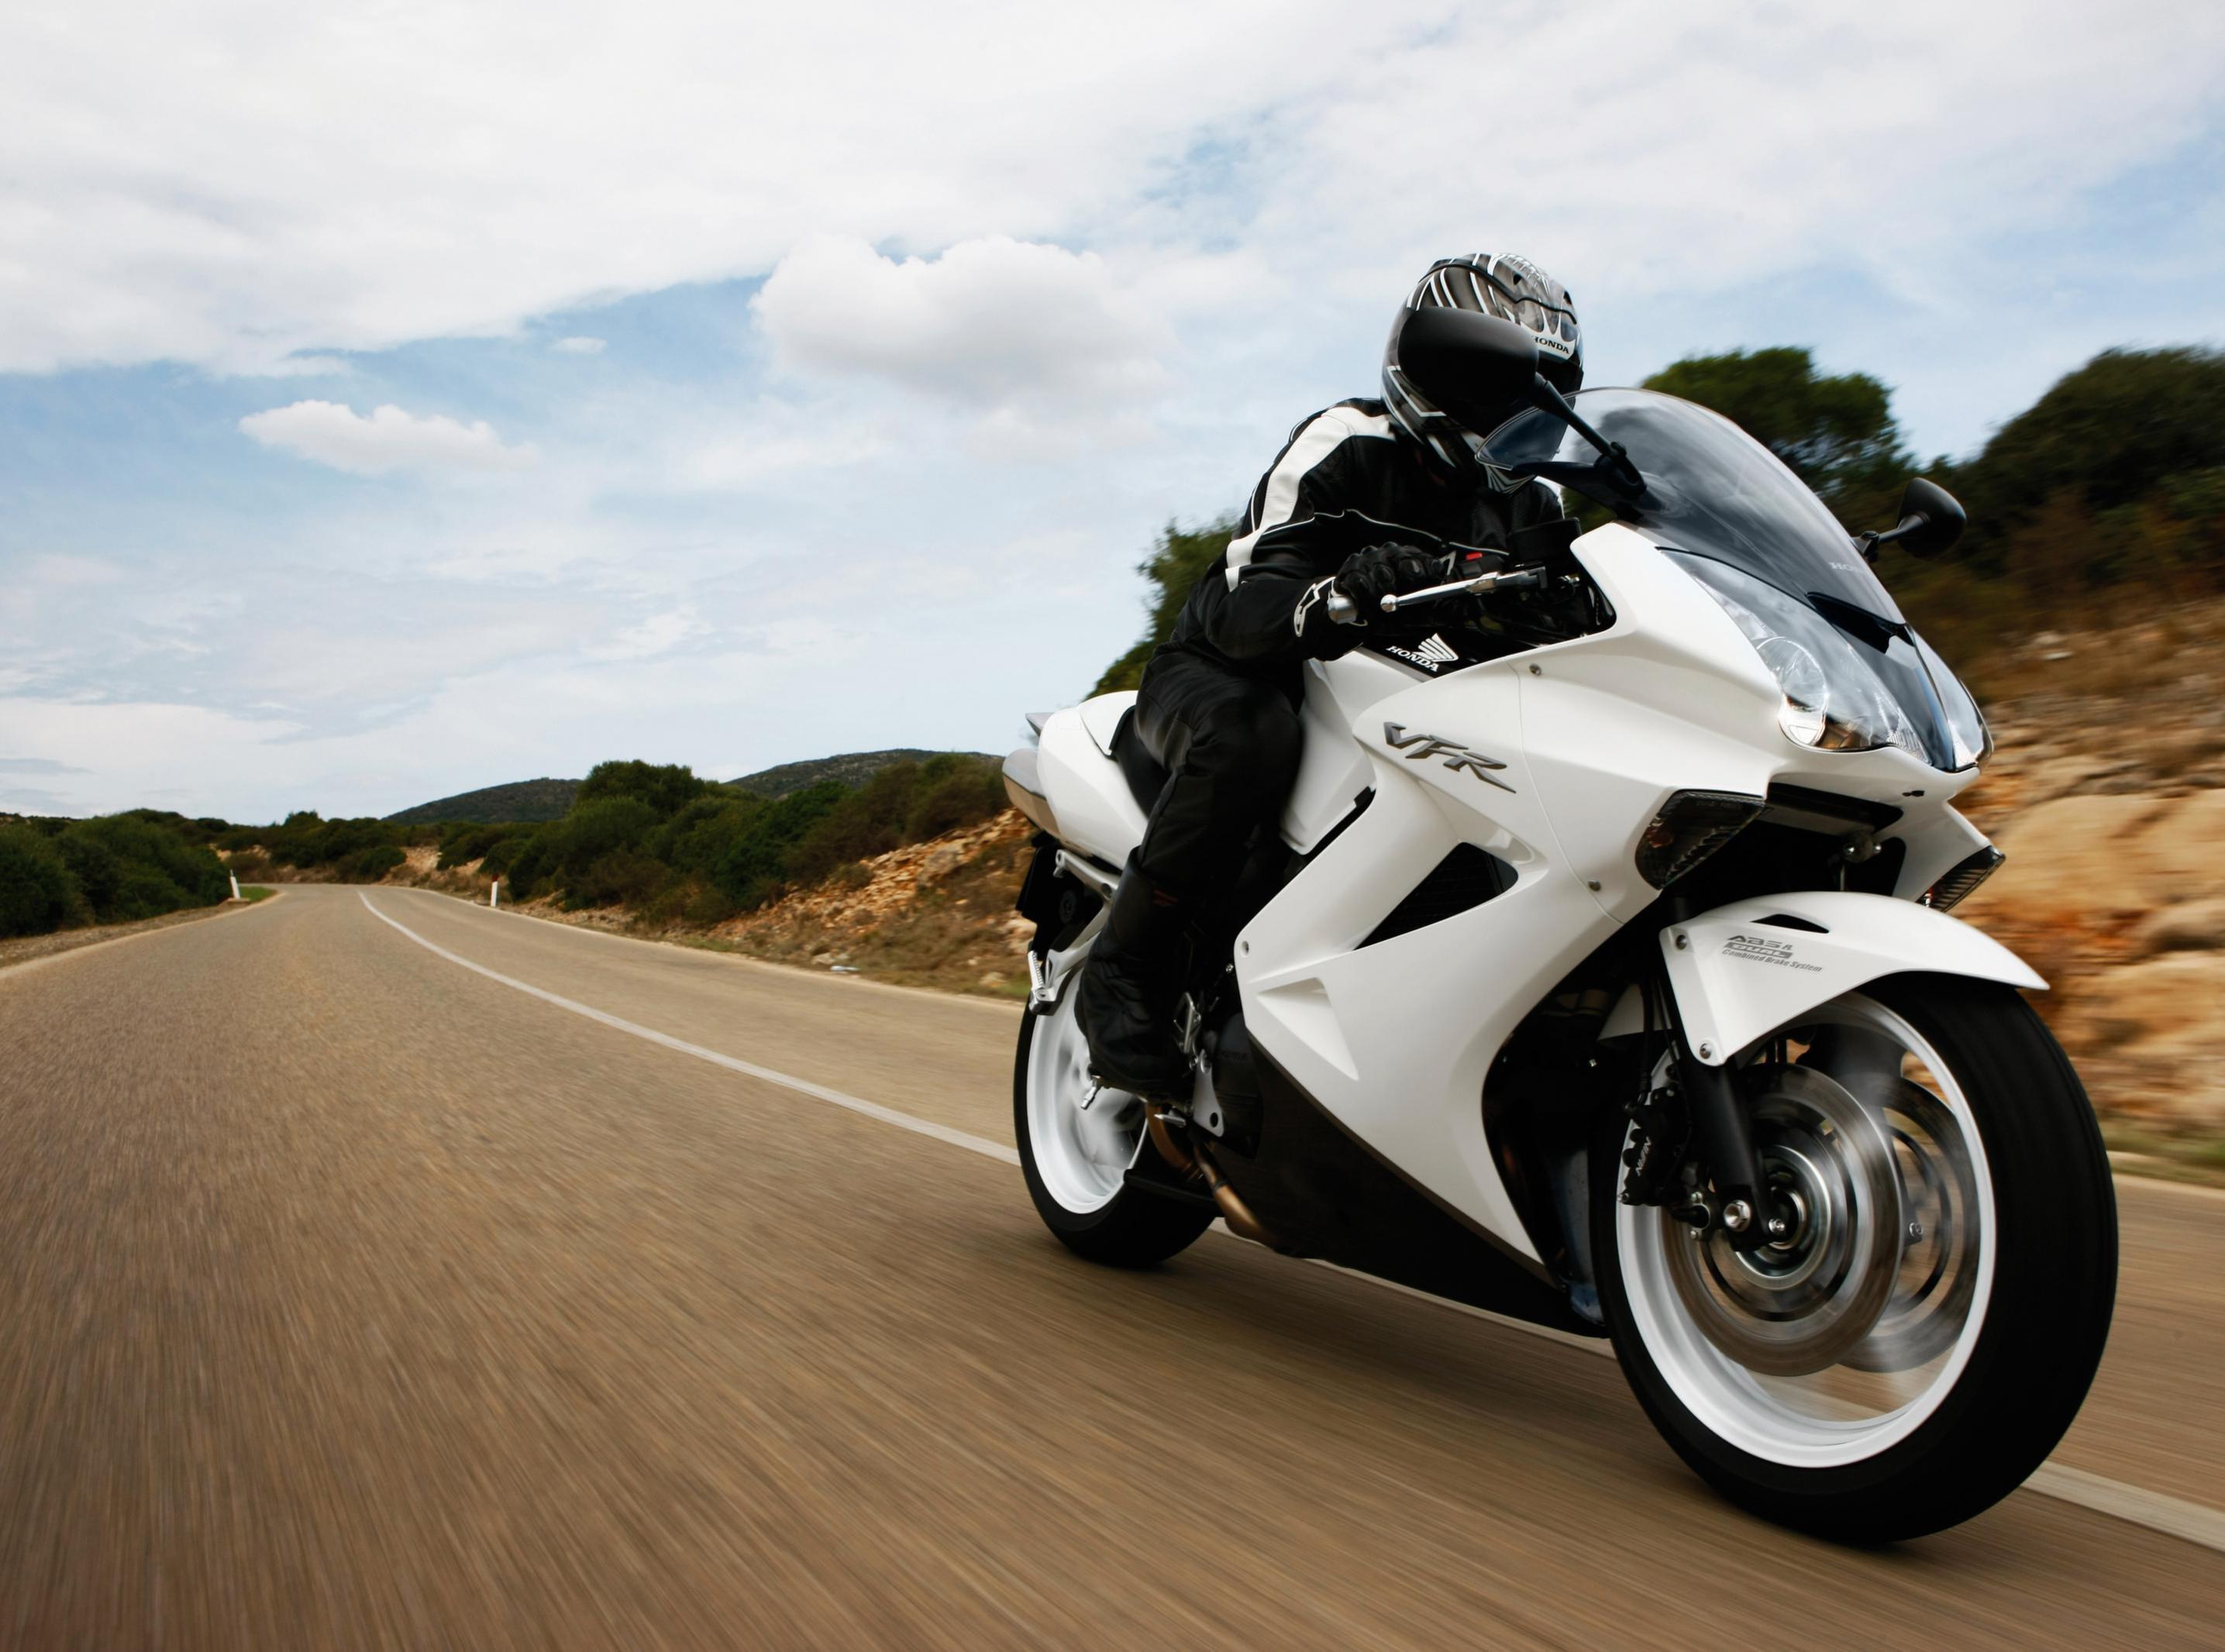 Фото мотоцикла homa f5 13 фотография